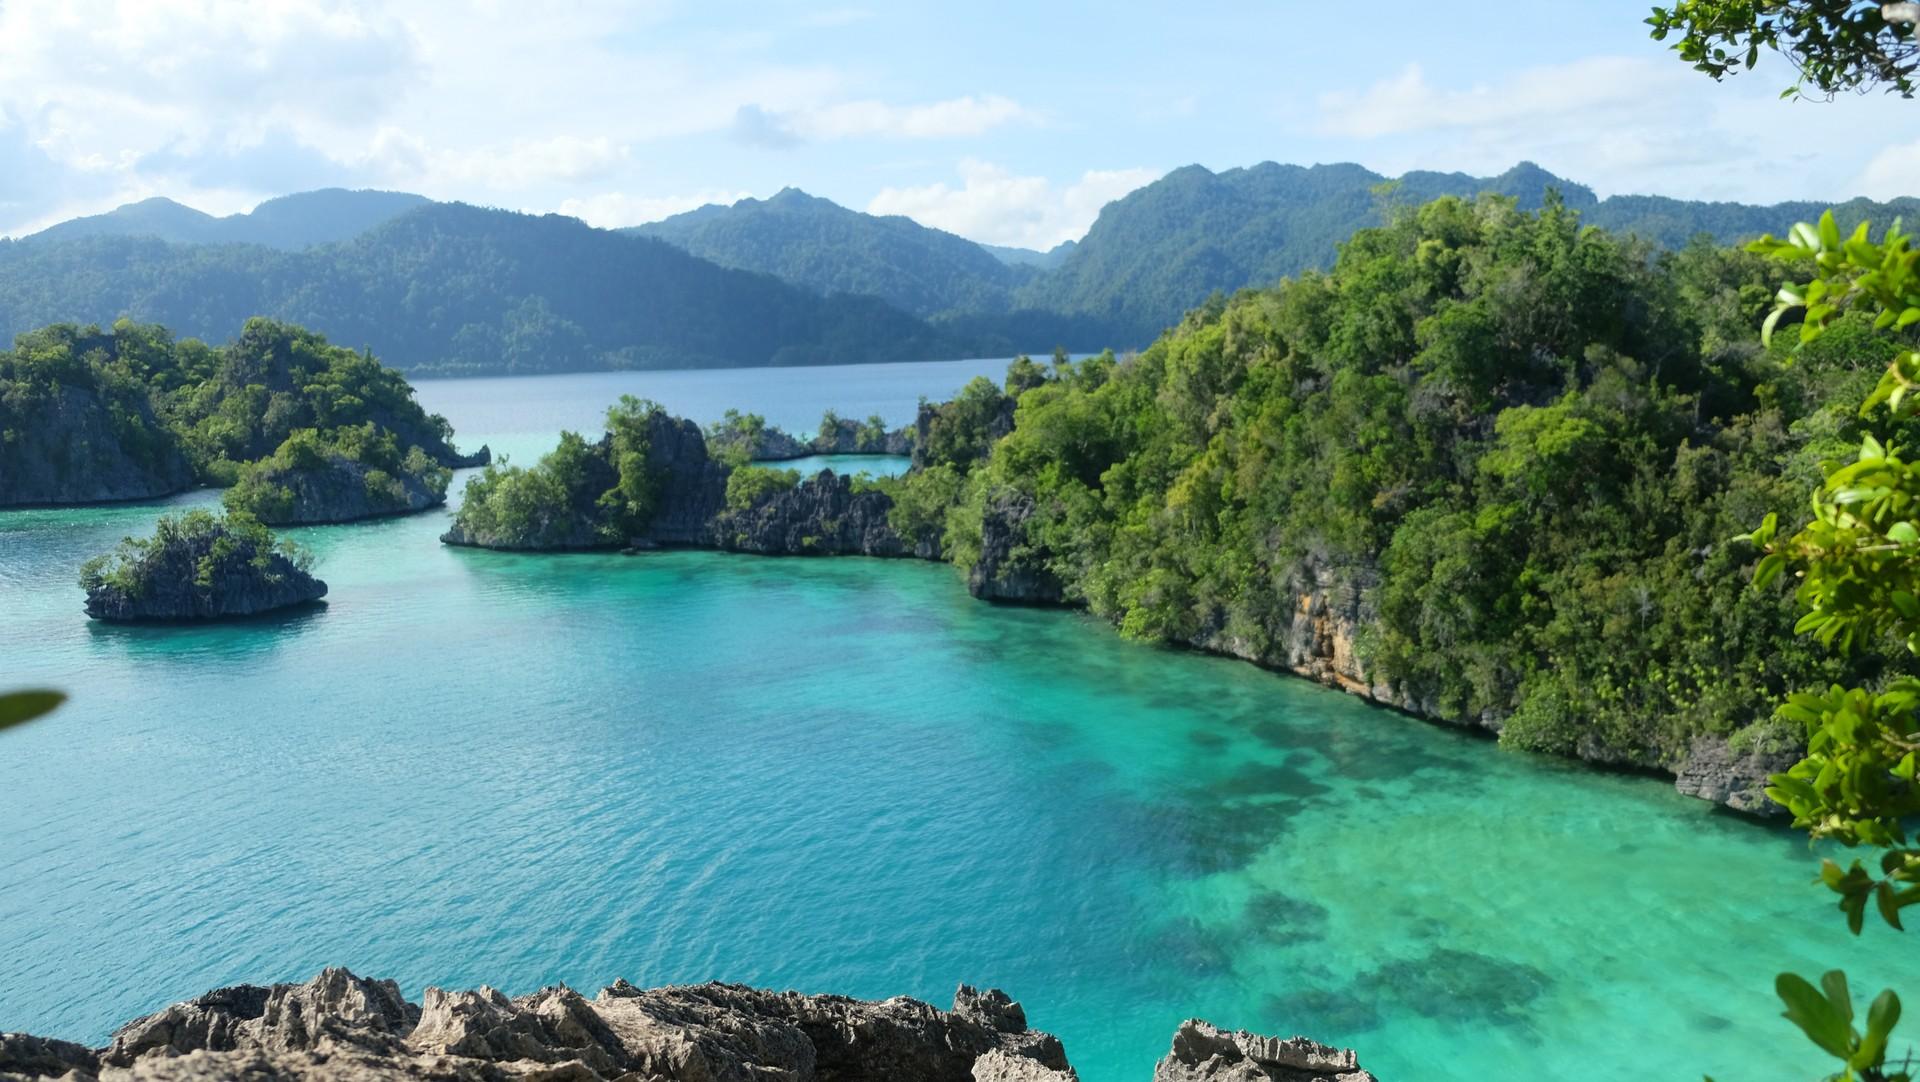 Sulawesi in Indonesia